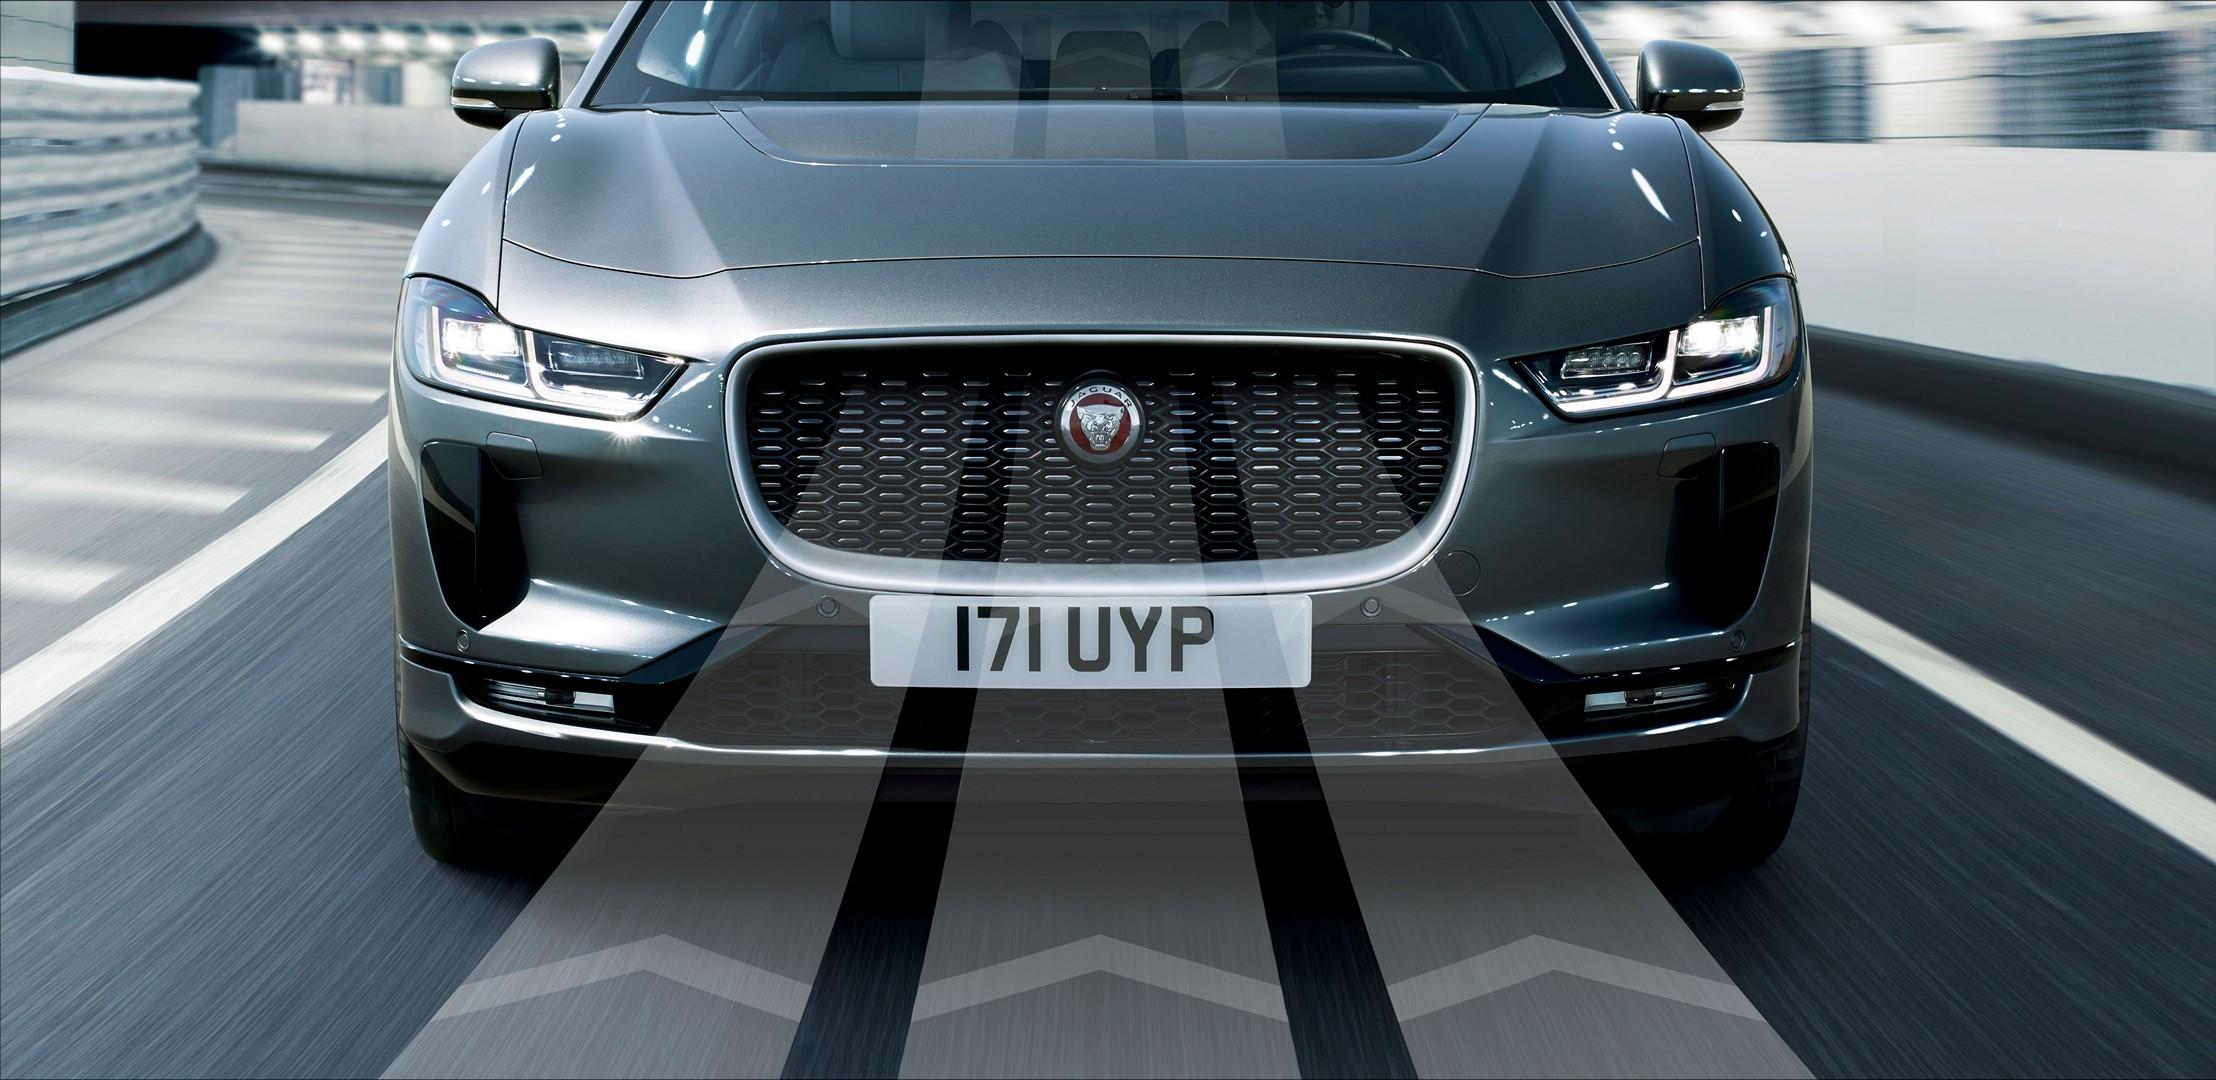 2020 Jaguar I-Pace Update Offers 234 Miles of Range Thanks ...